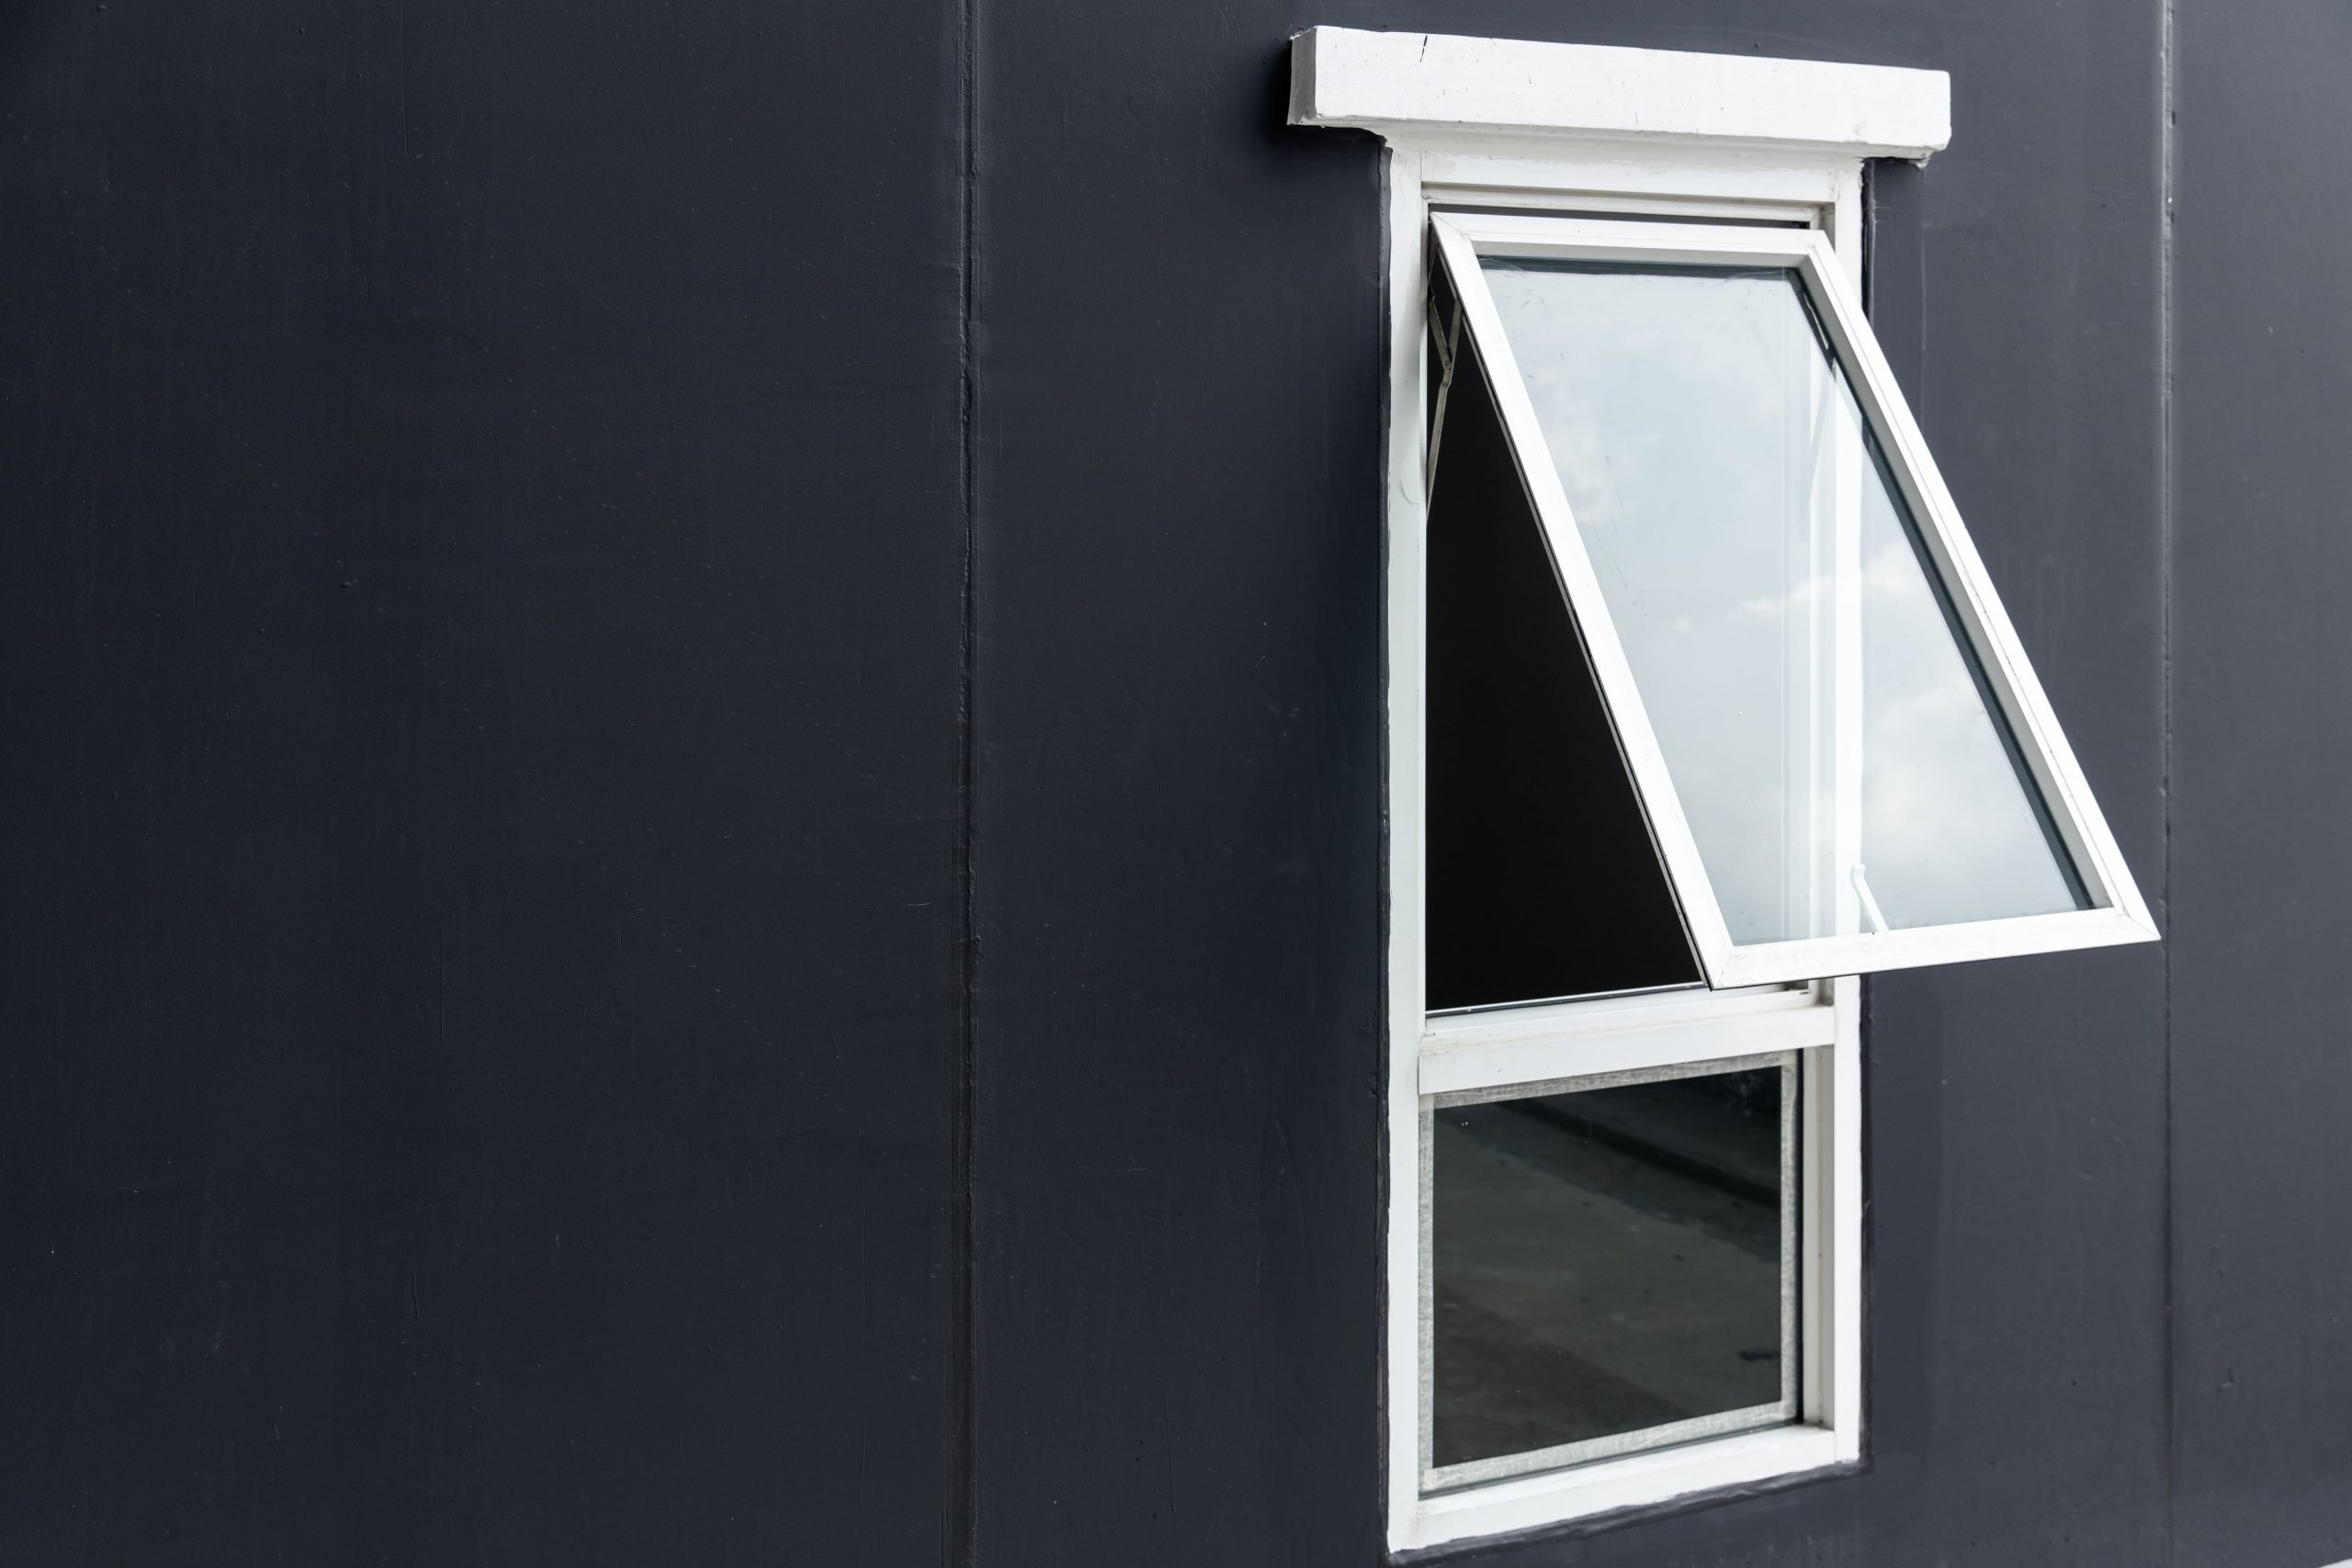 CASEMENT IMPACT WINDOW